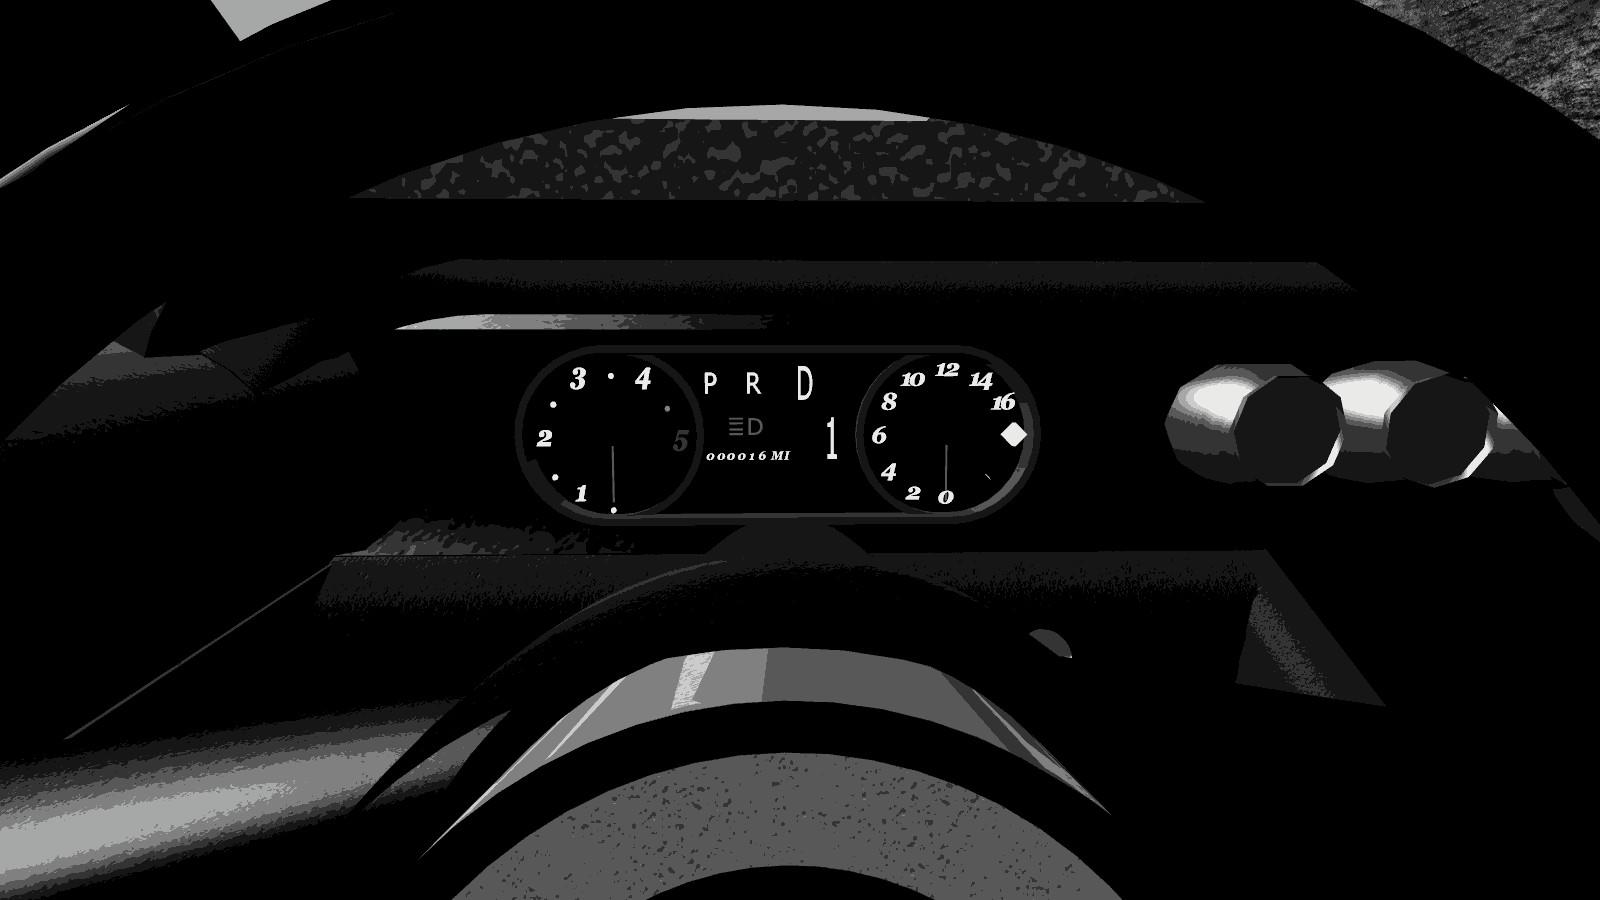 2018 Slithers Lambda Sedan Release - Garry's Mod - Facepunch Forum